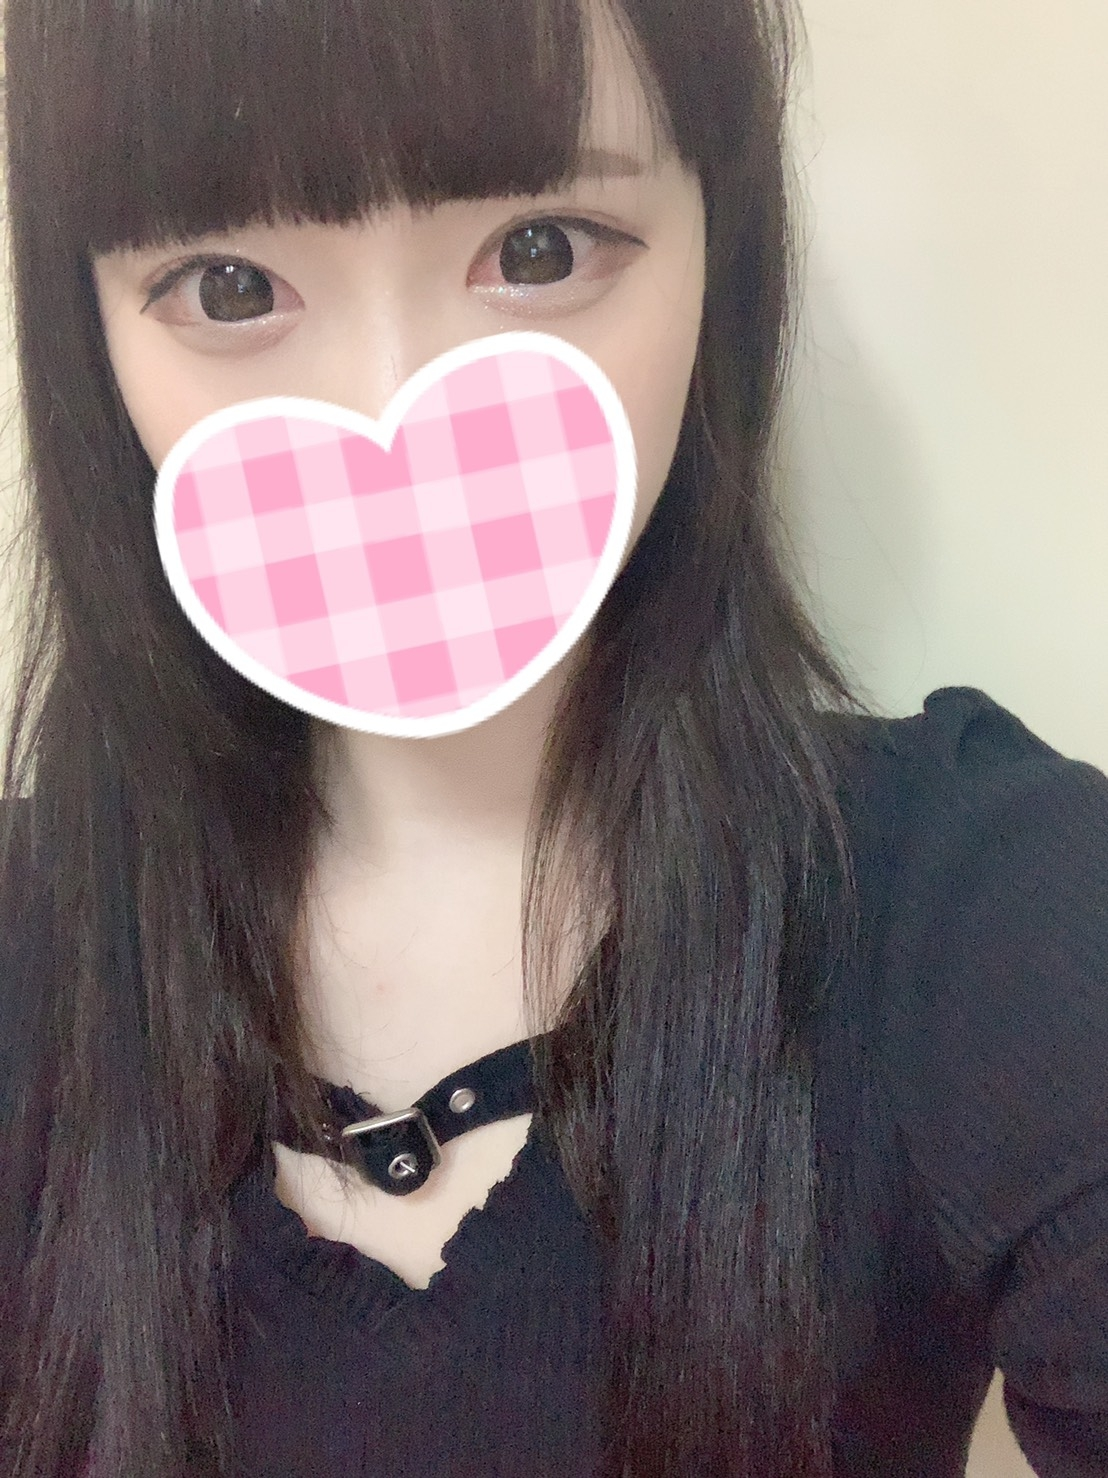 【JKリフレ東京】小林まりあ JK上がりたて18歳